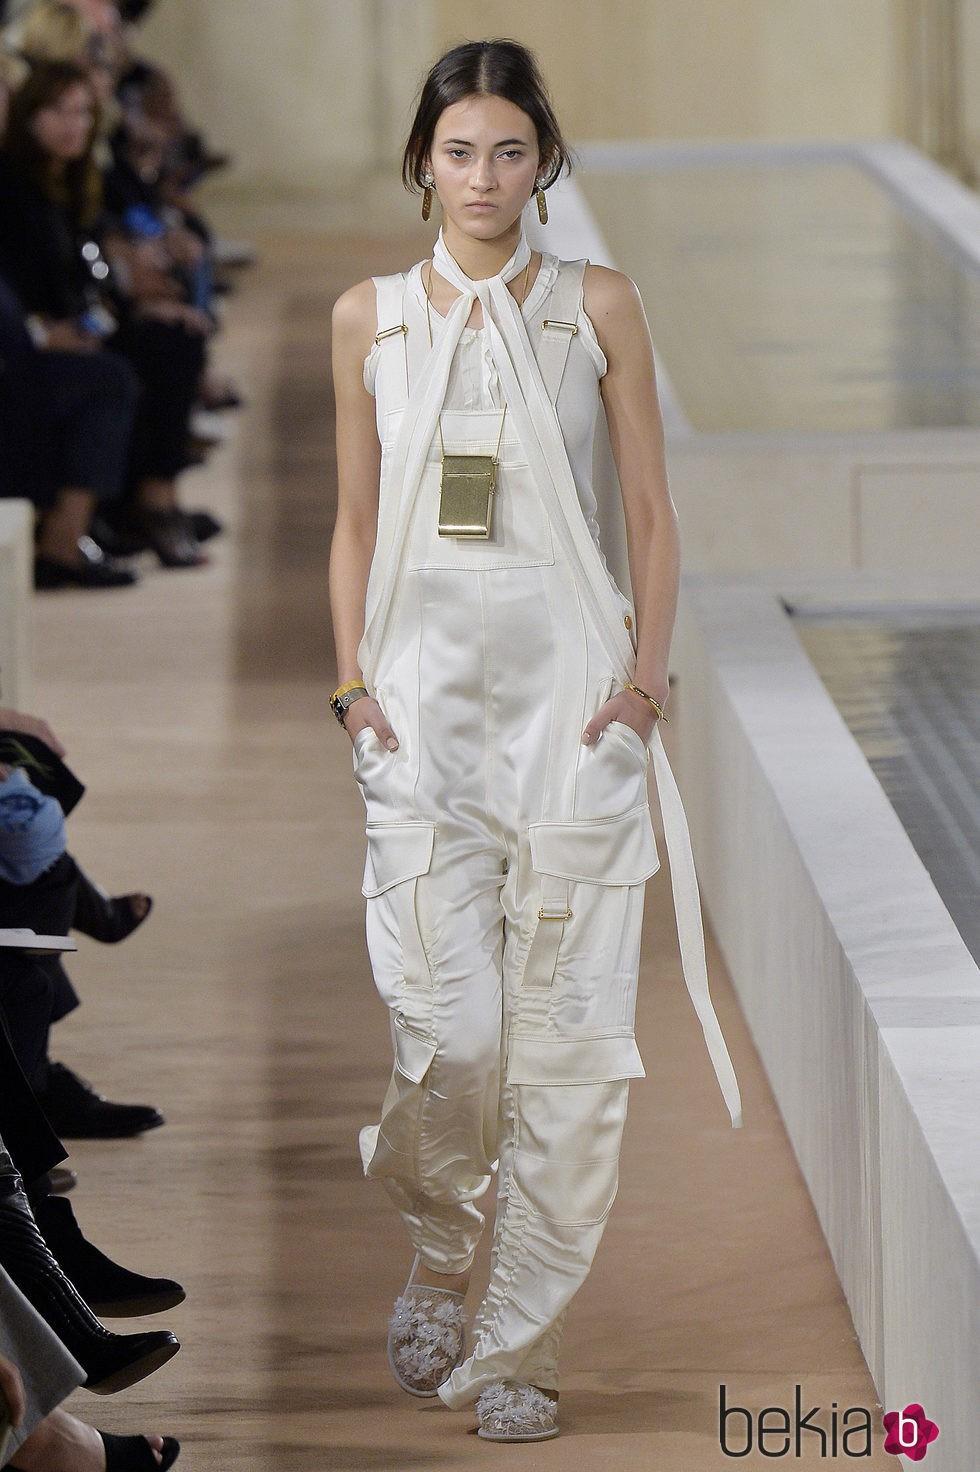 a8d2e95be4 Anterior Peto blanco de la colección primavera verano 2016 de Balenciaga en Paris  Fashion Week